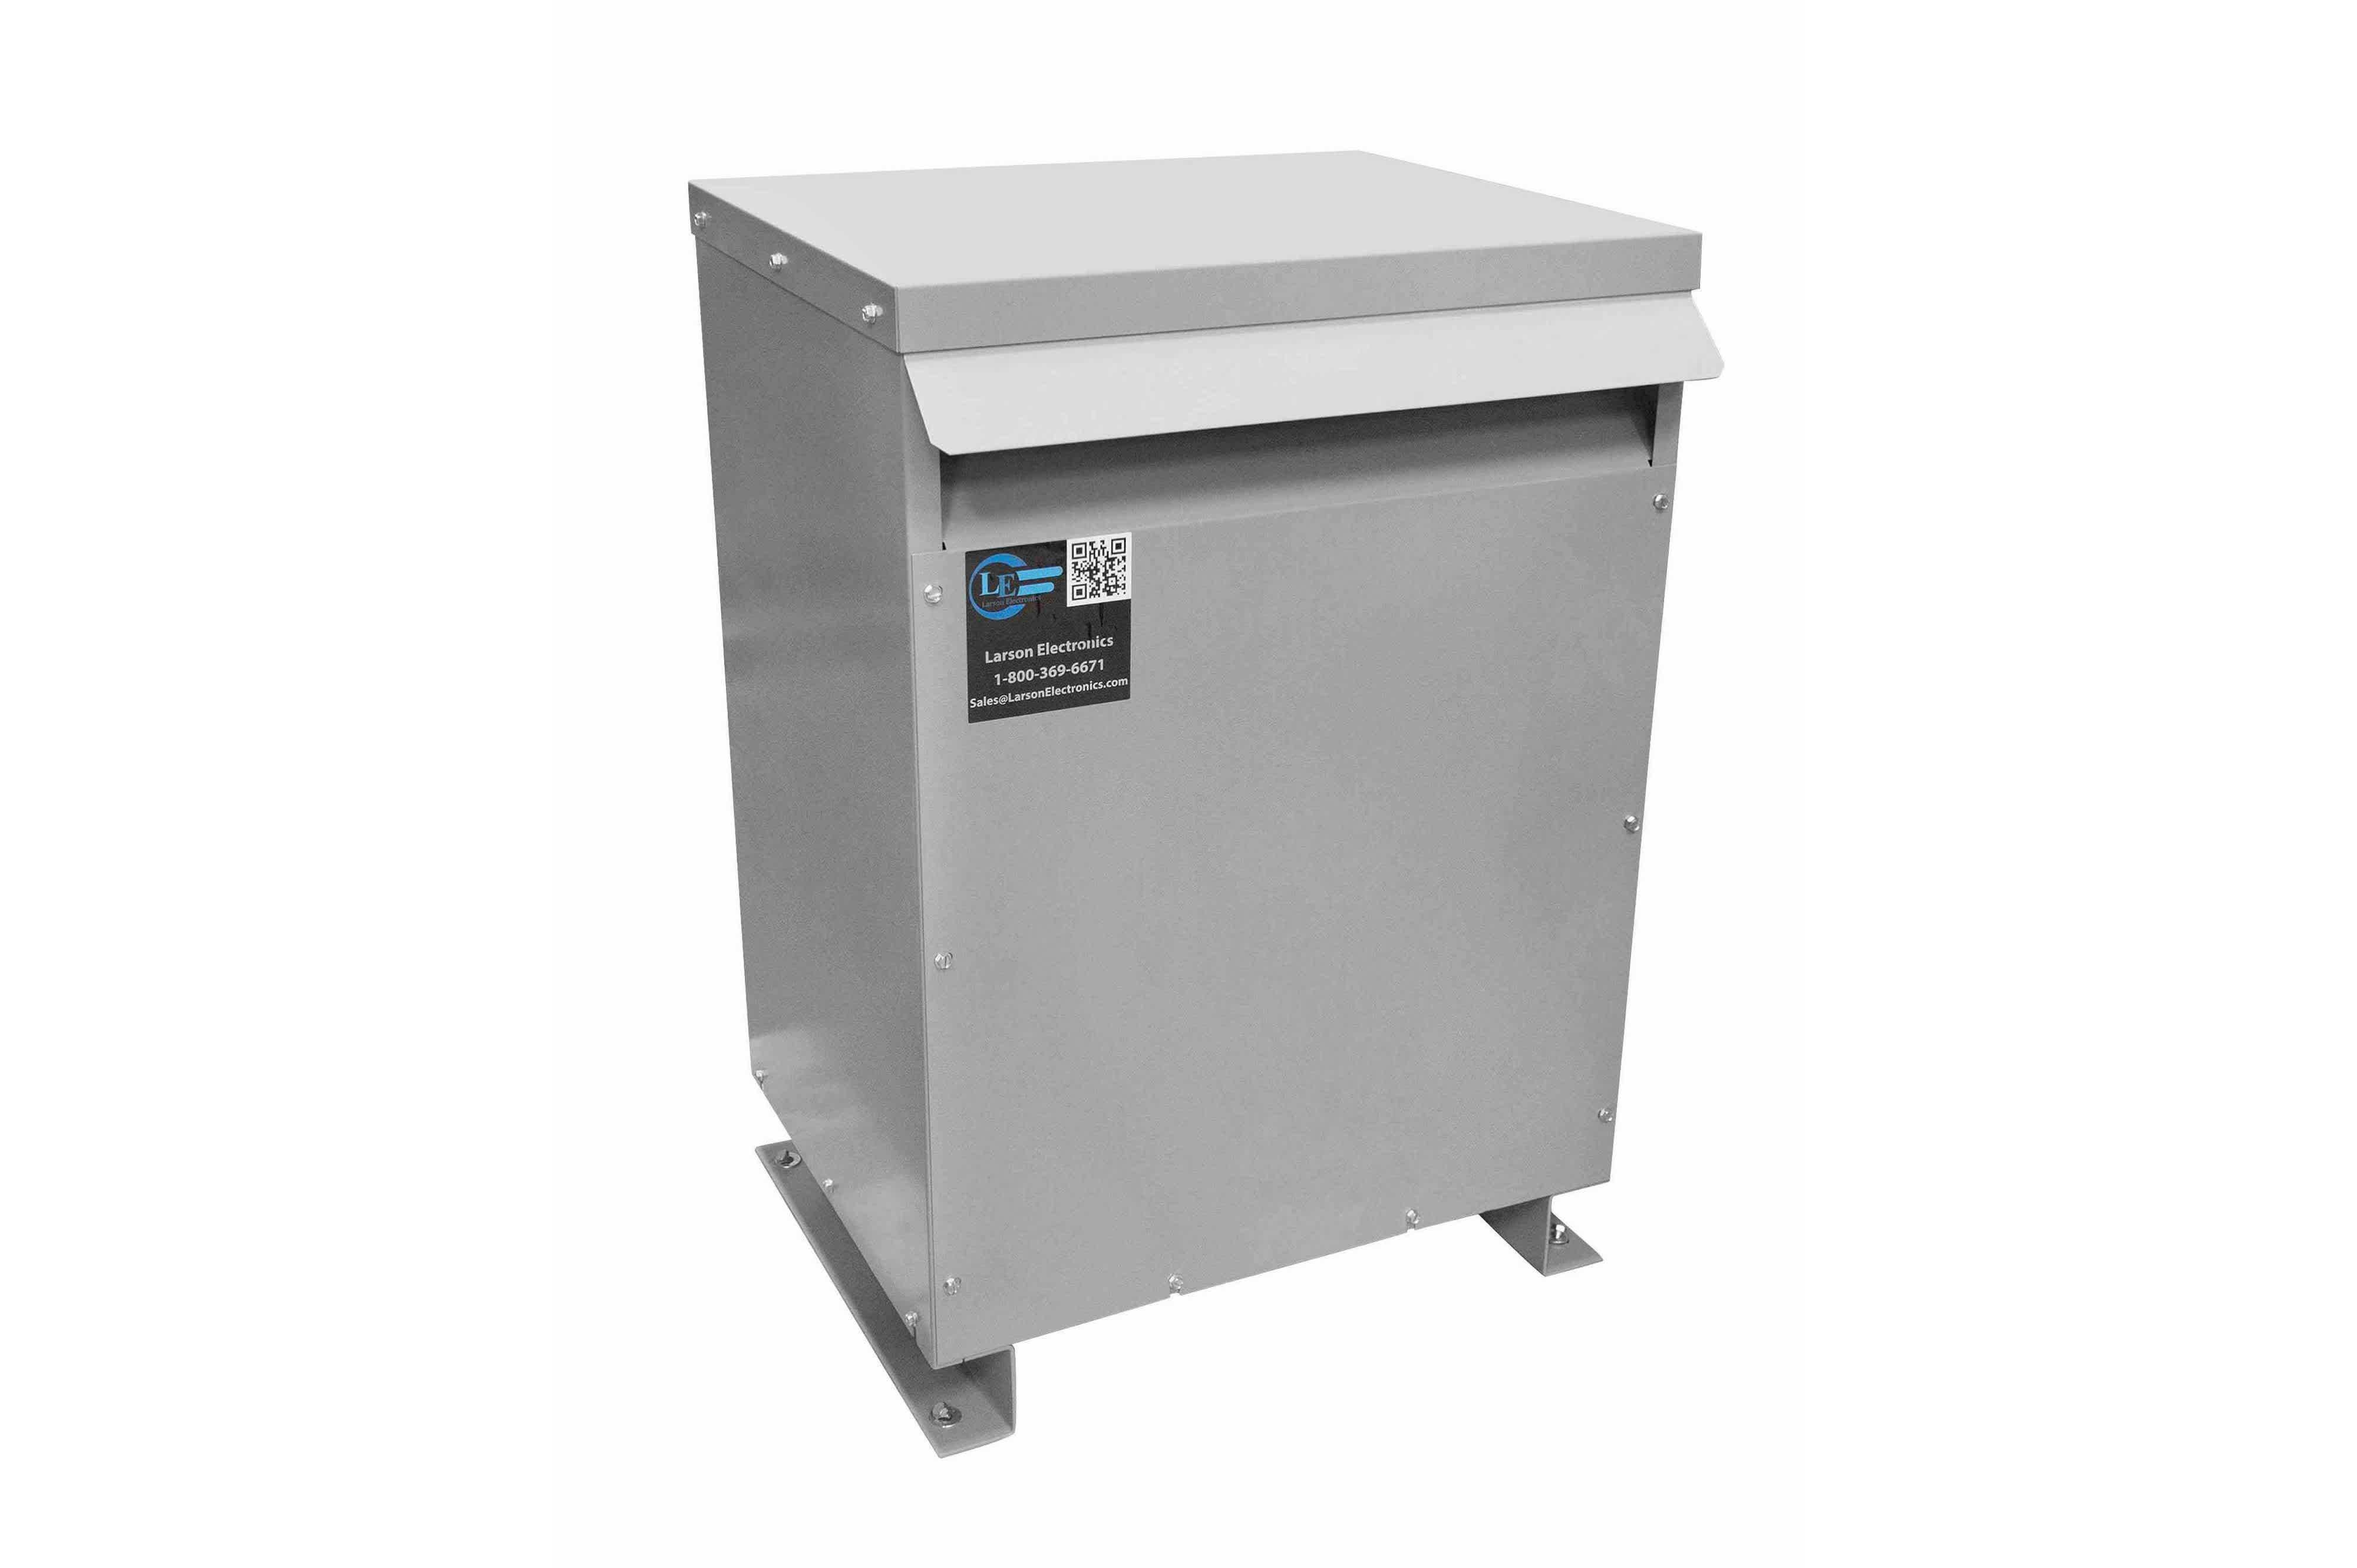 70 kVA 3PH Isolation Transformer, 480V Wye Primary, 400Y/231 Wye-N Secondary, N3R, Ventilated, 60 Hz